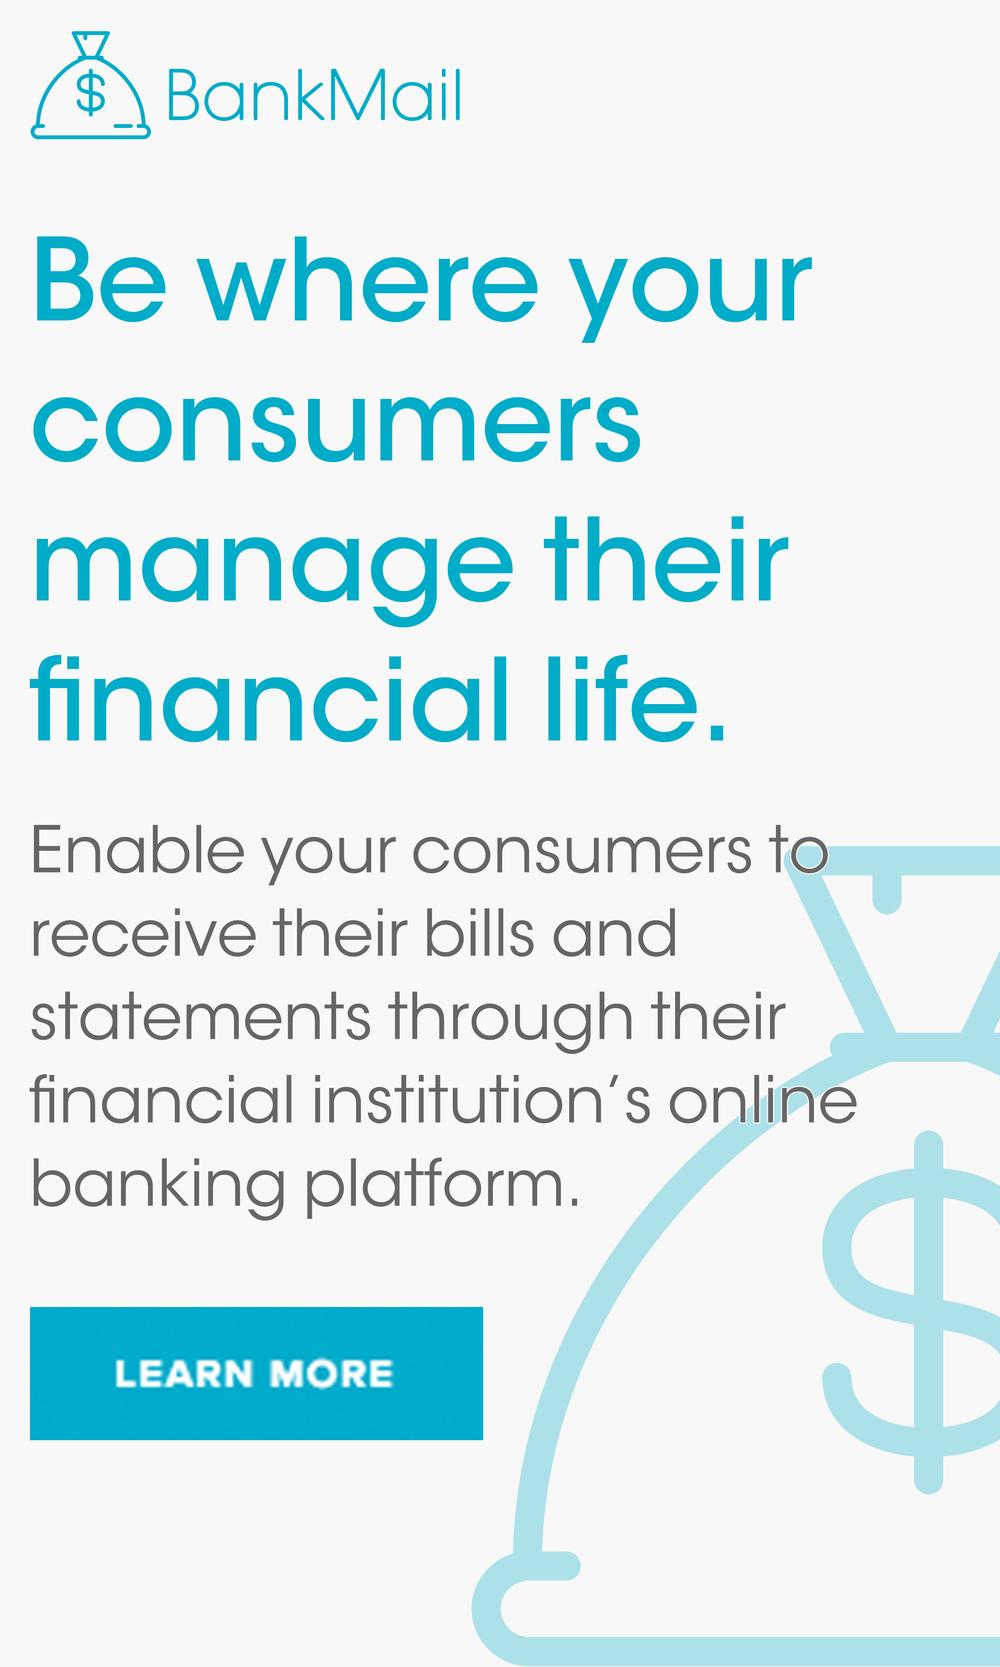 BankMail.jpg